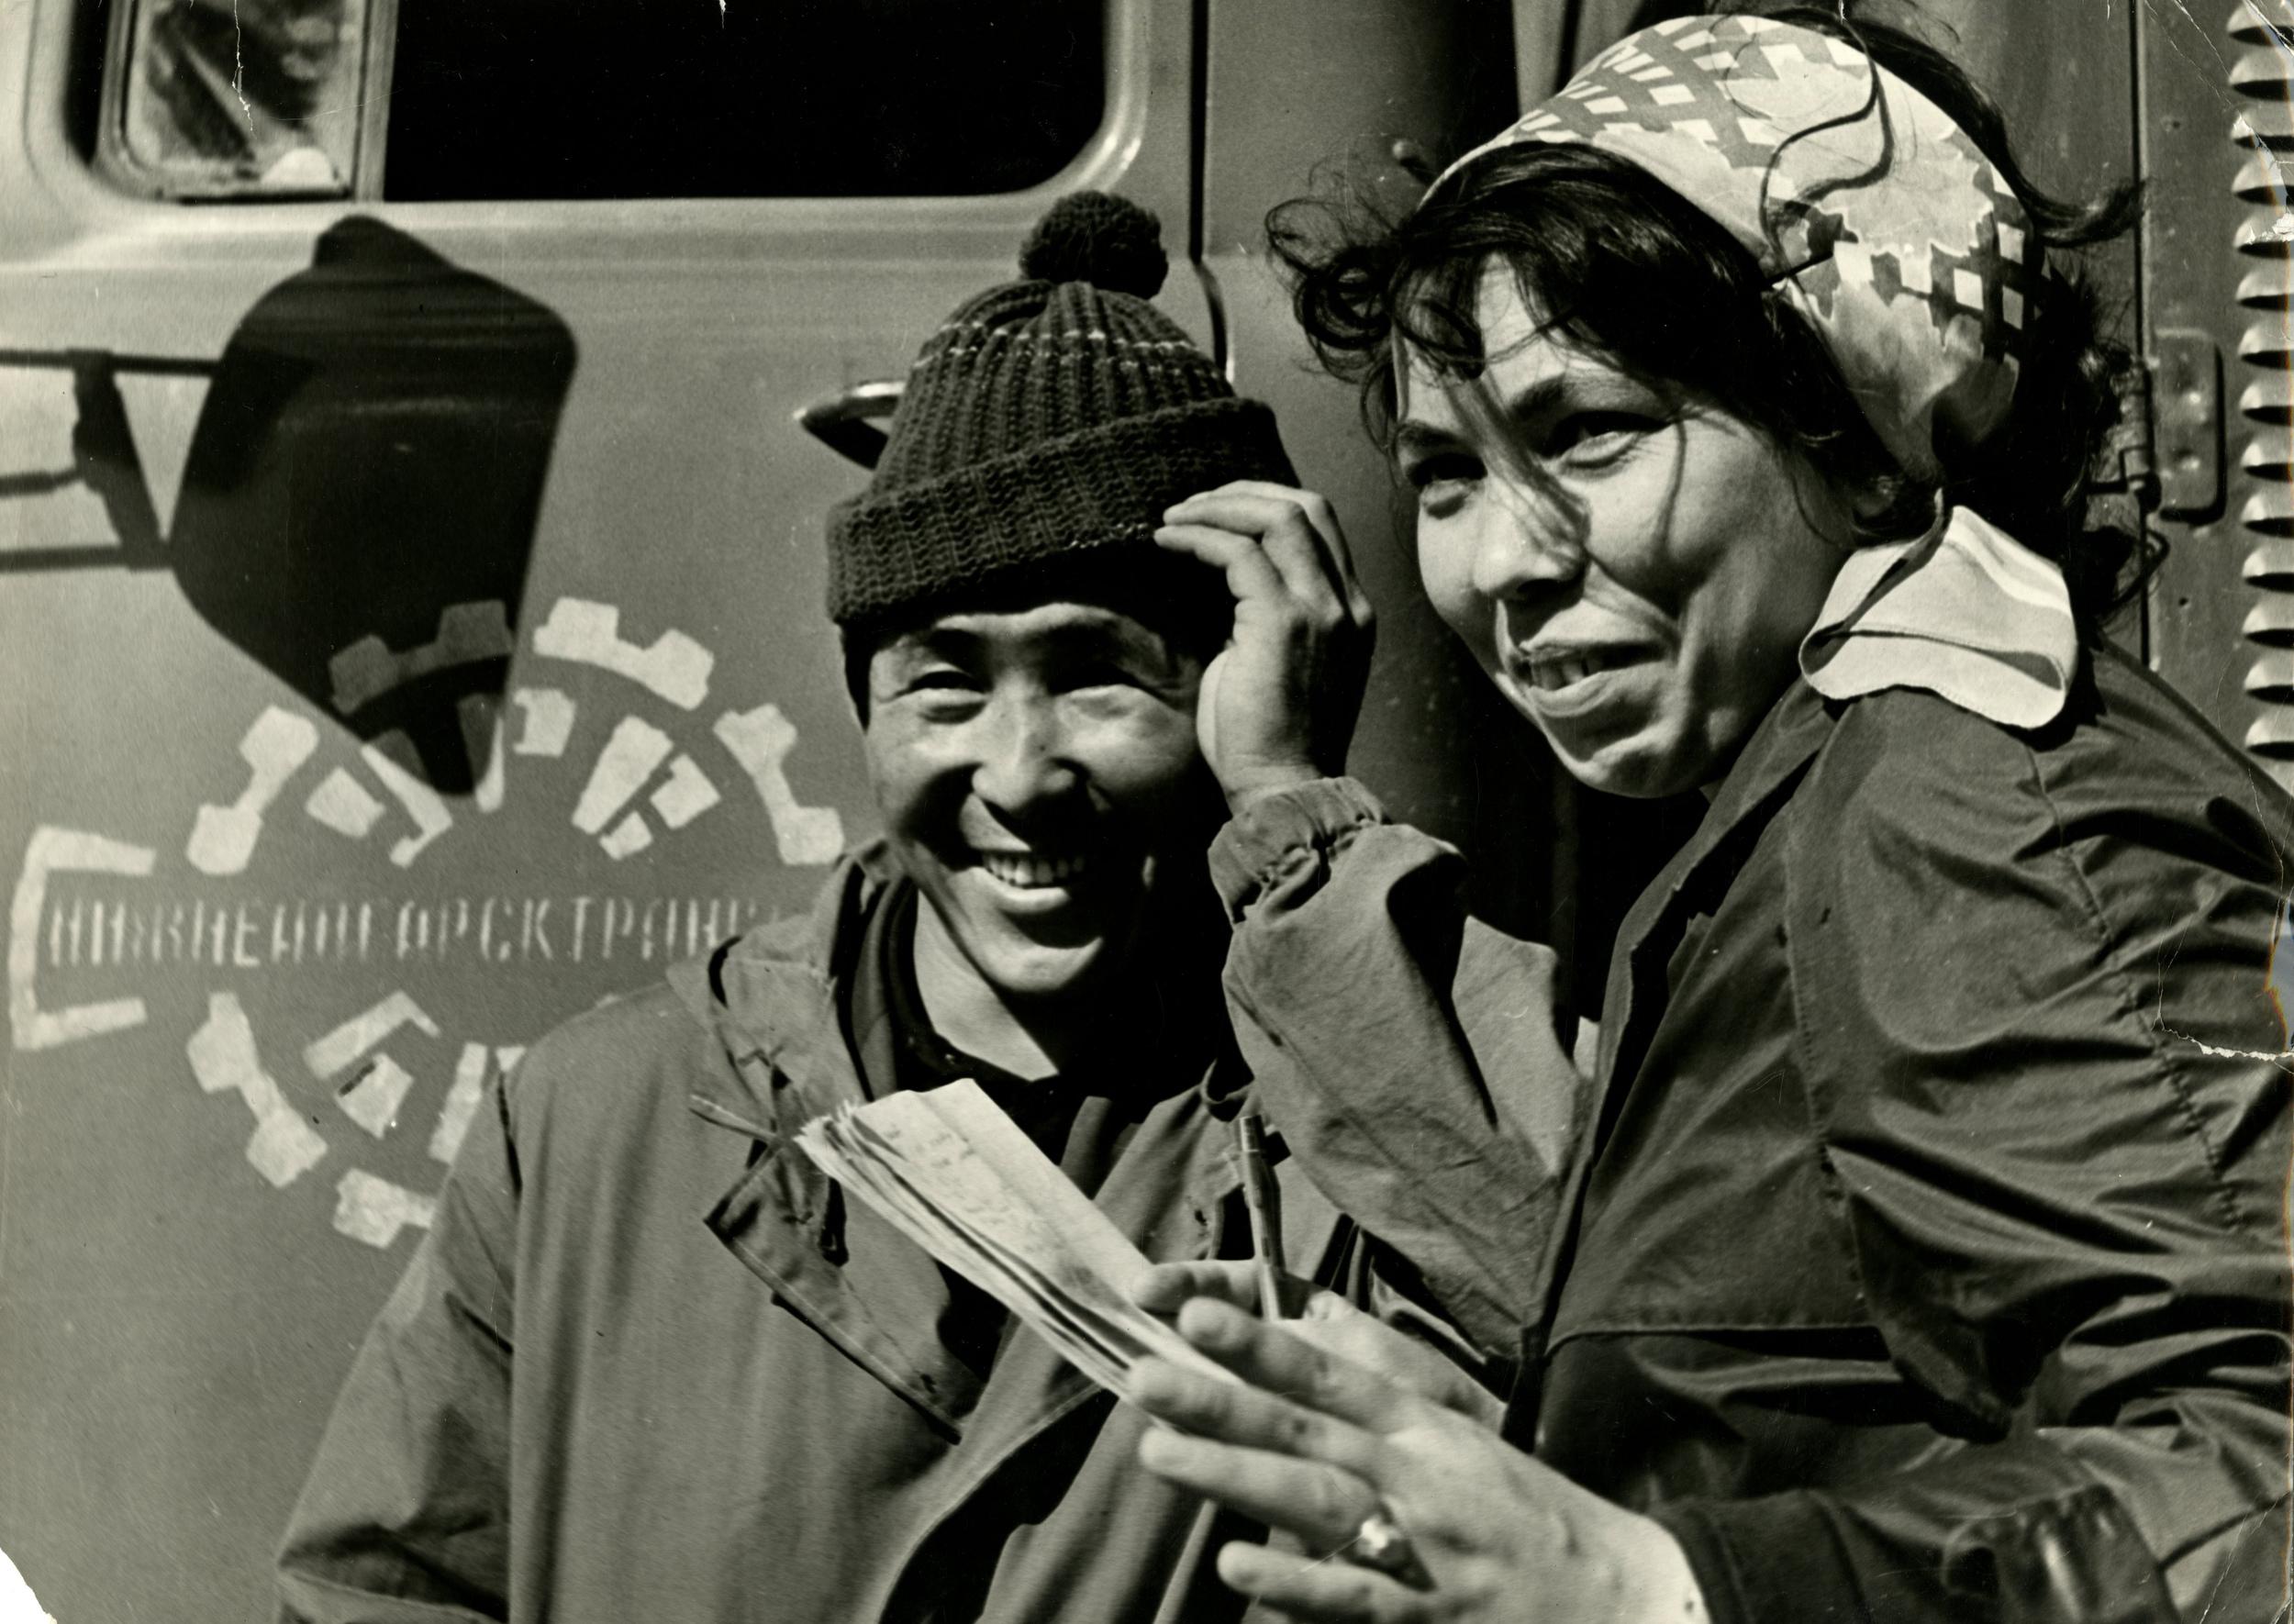 1970-е. Мельник Т.Н. «БАМ. Нижнеангарск. У машины»